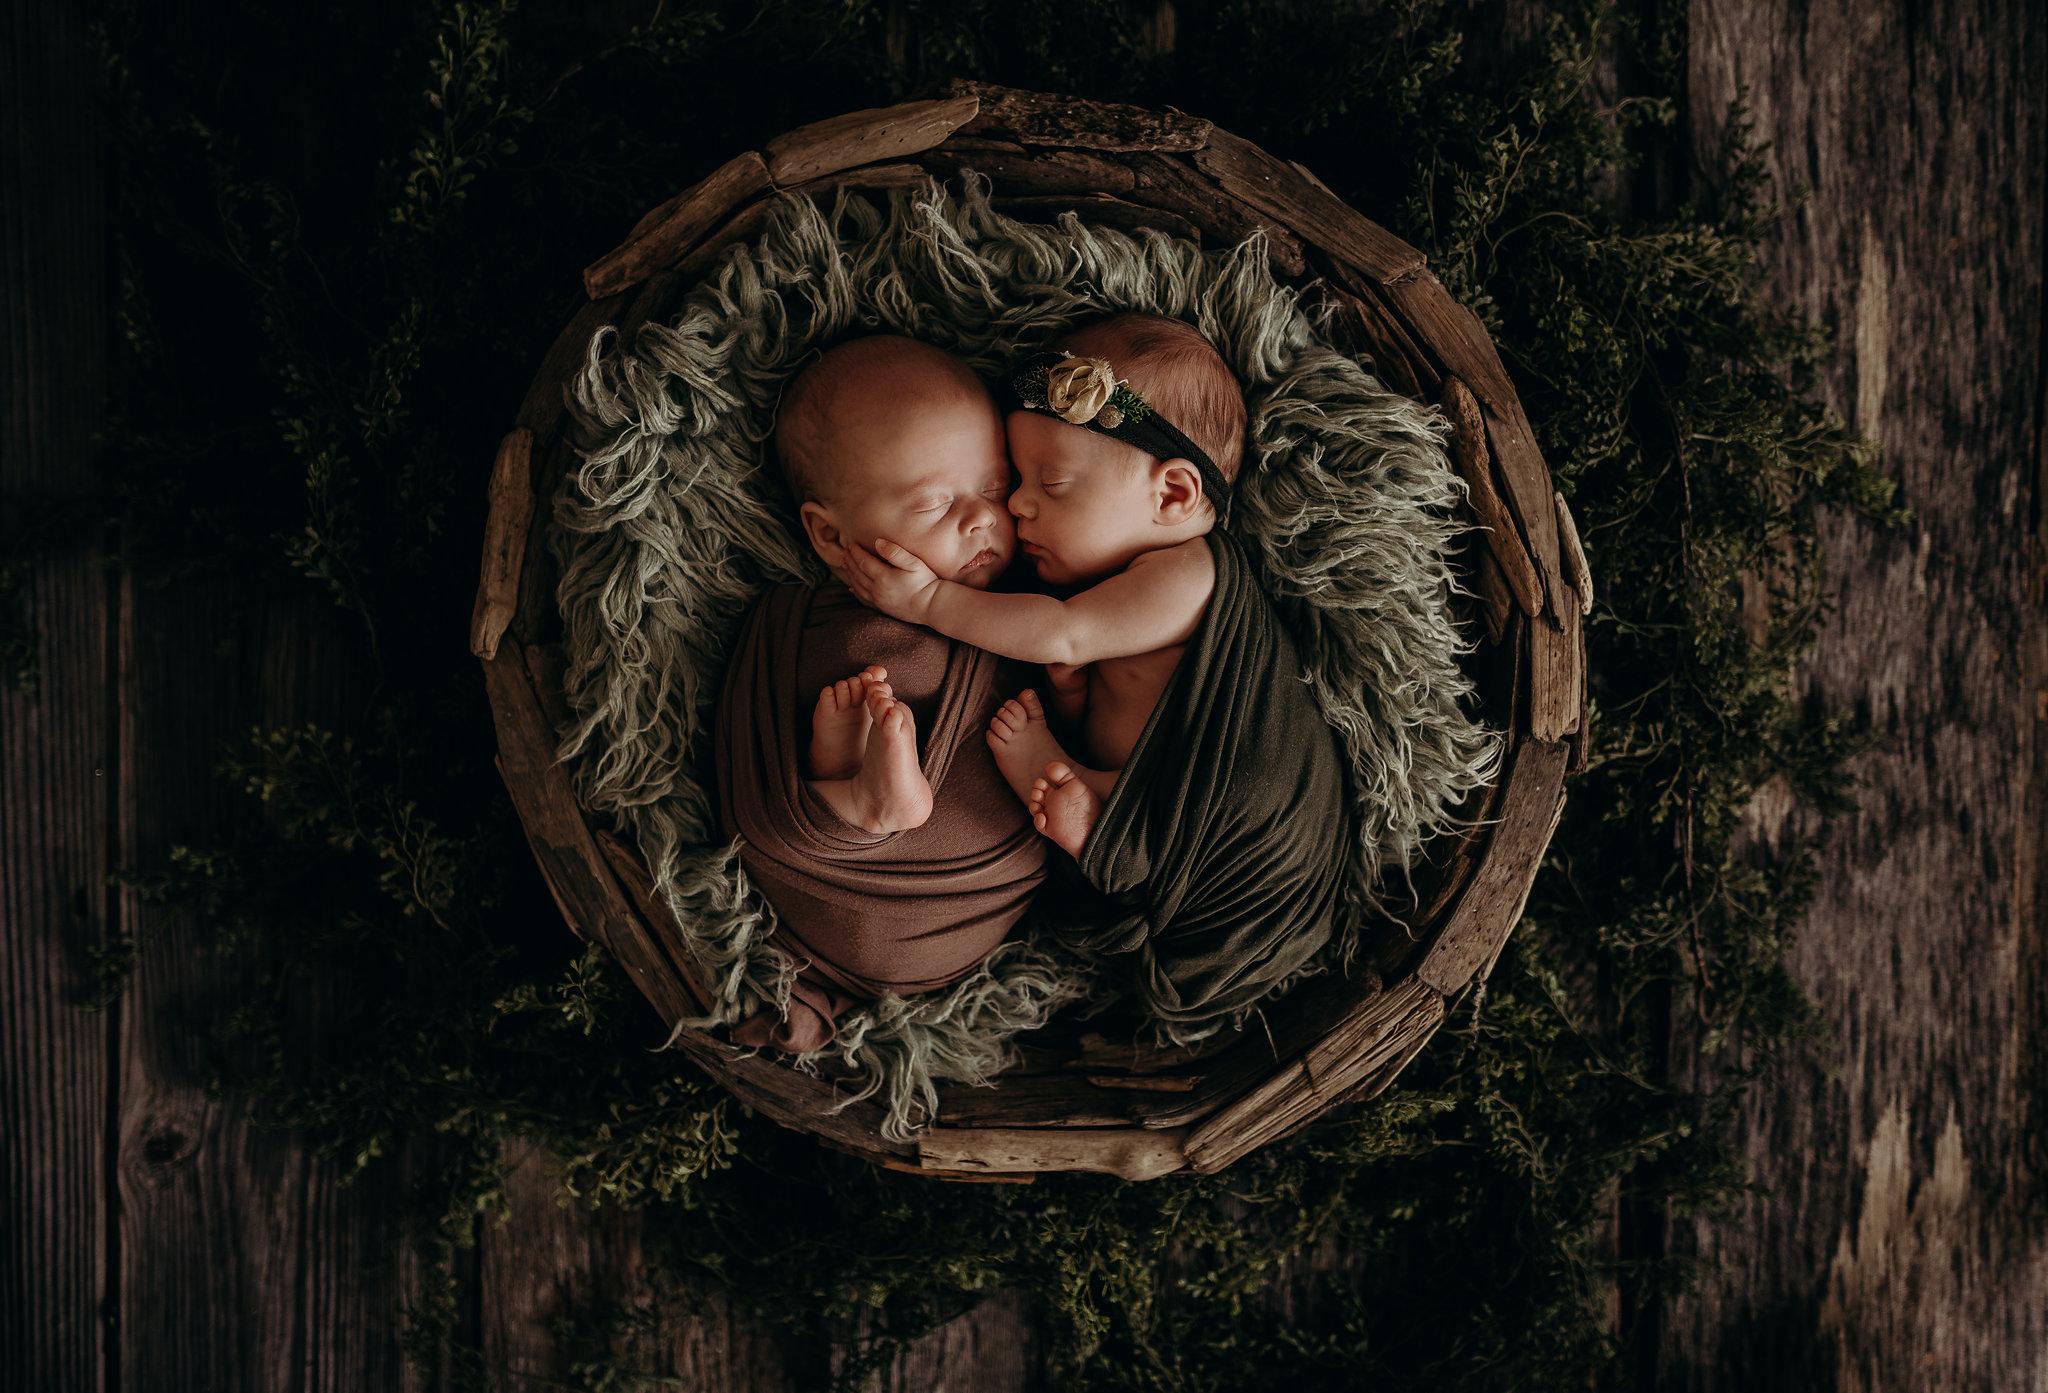 Noah-Emma-Twins-Studio-Newborn-SEssion-Jesse-Salter-Photography-41.jpg